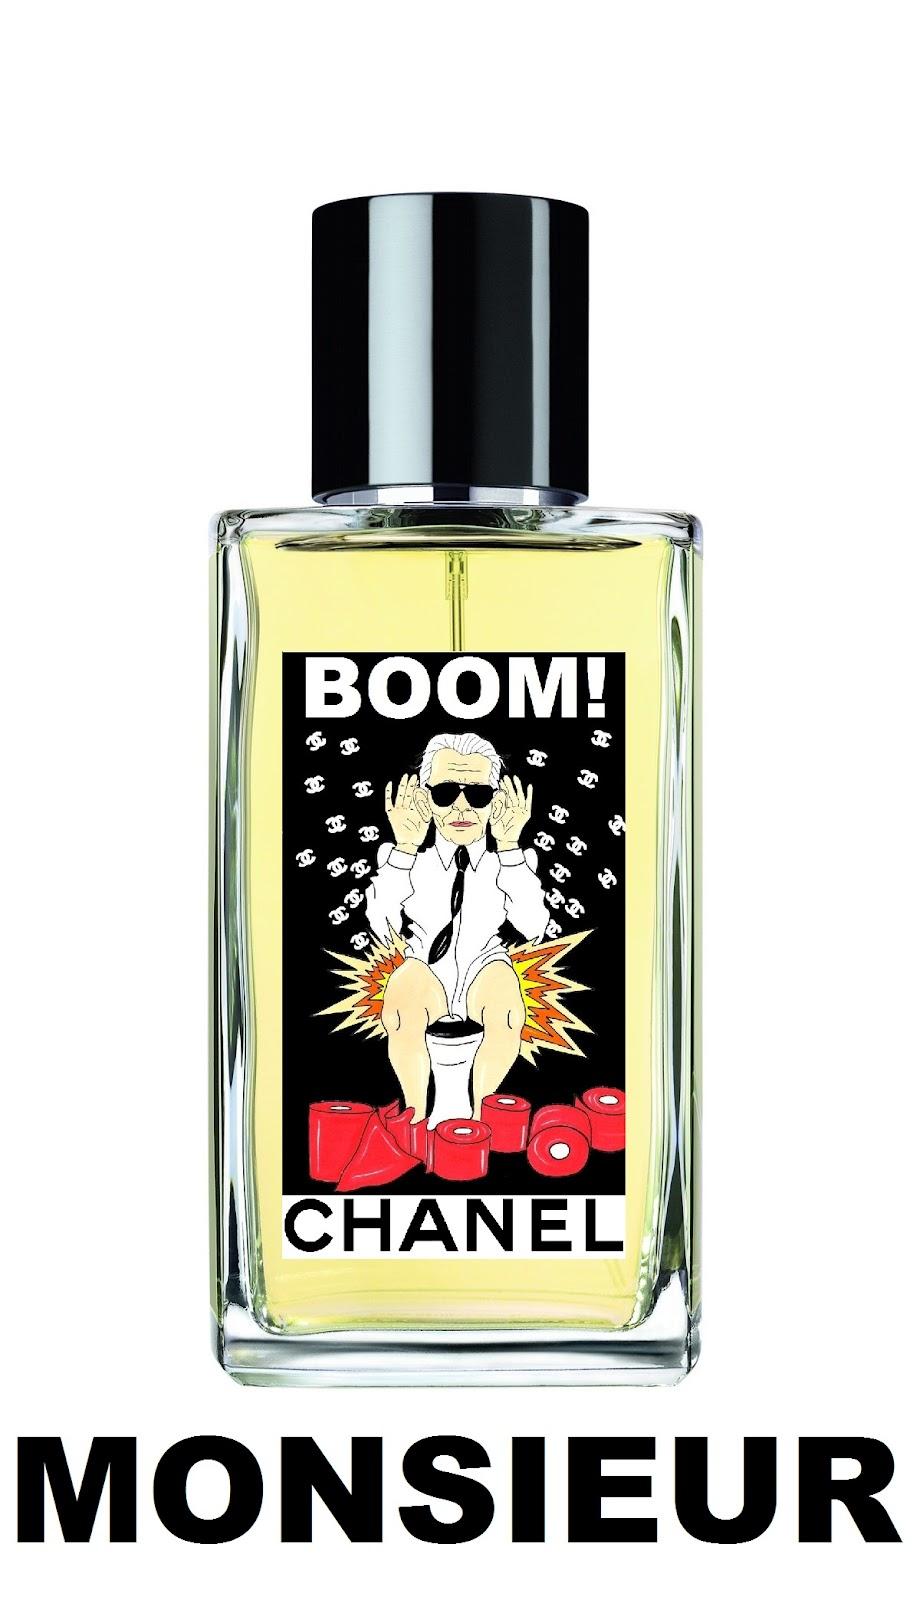 Karl+Lagerfeld+Parfum+CHANEL+POUR+MONSIEUR+Humor+Chic+by+aleXsandro+Palombo.jpg